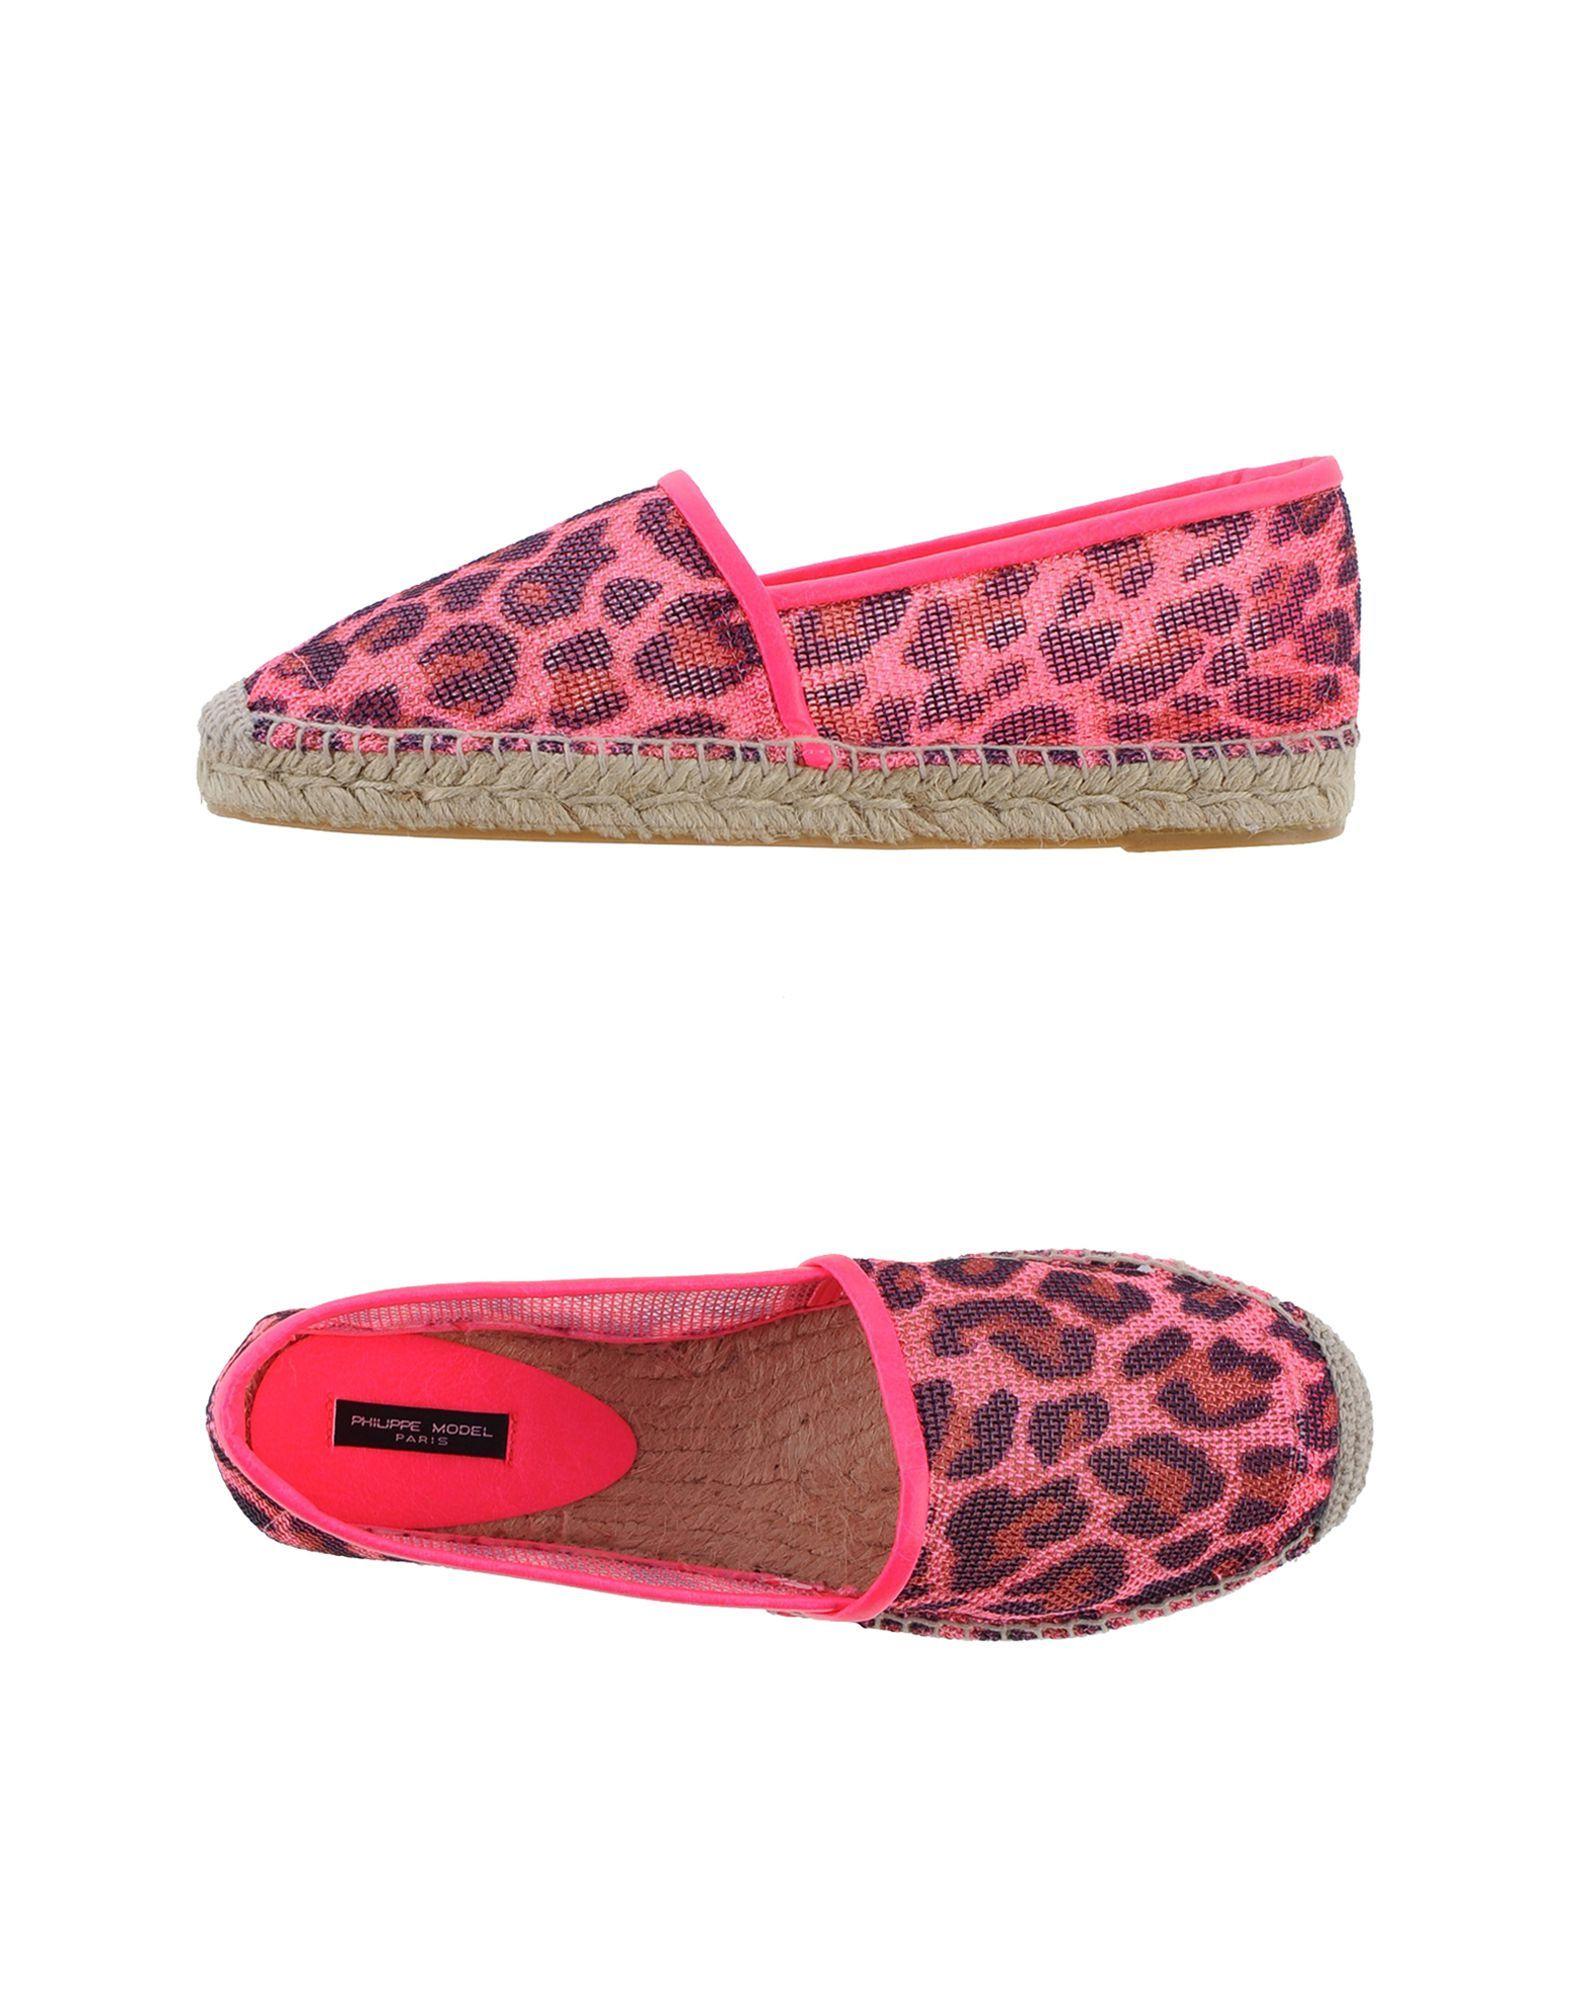 Philippe Model Pink Leopard Print Espadrilles